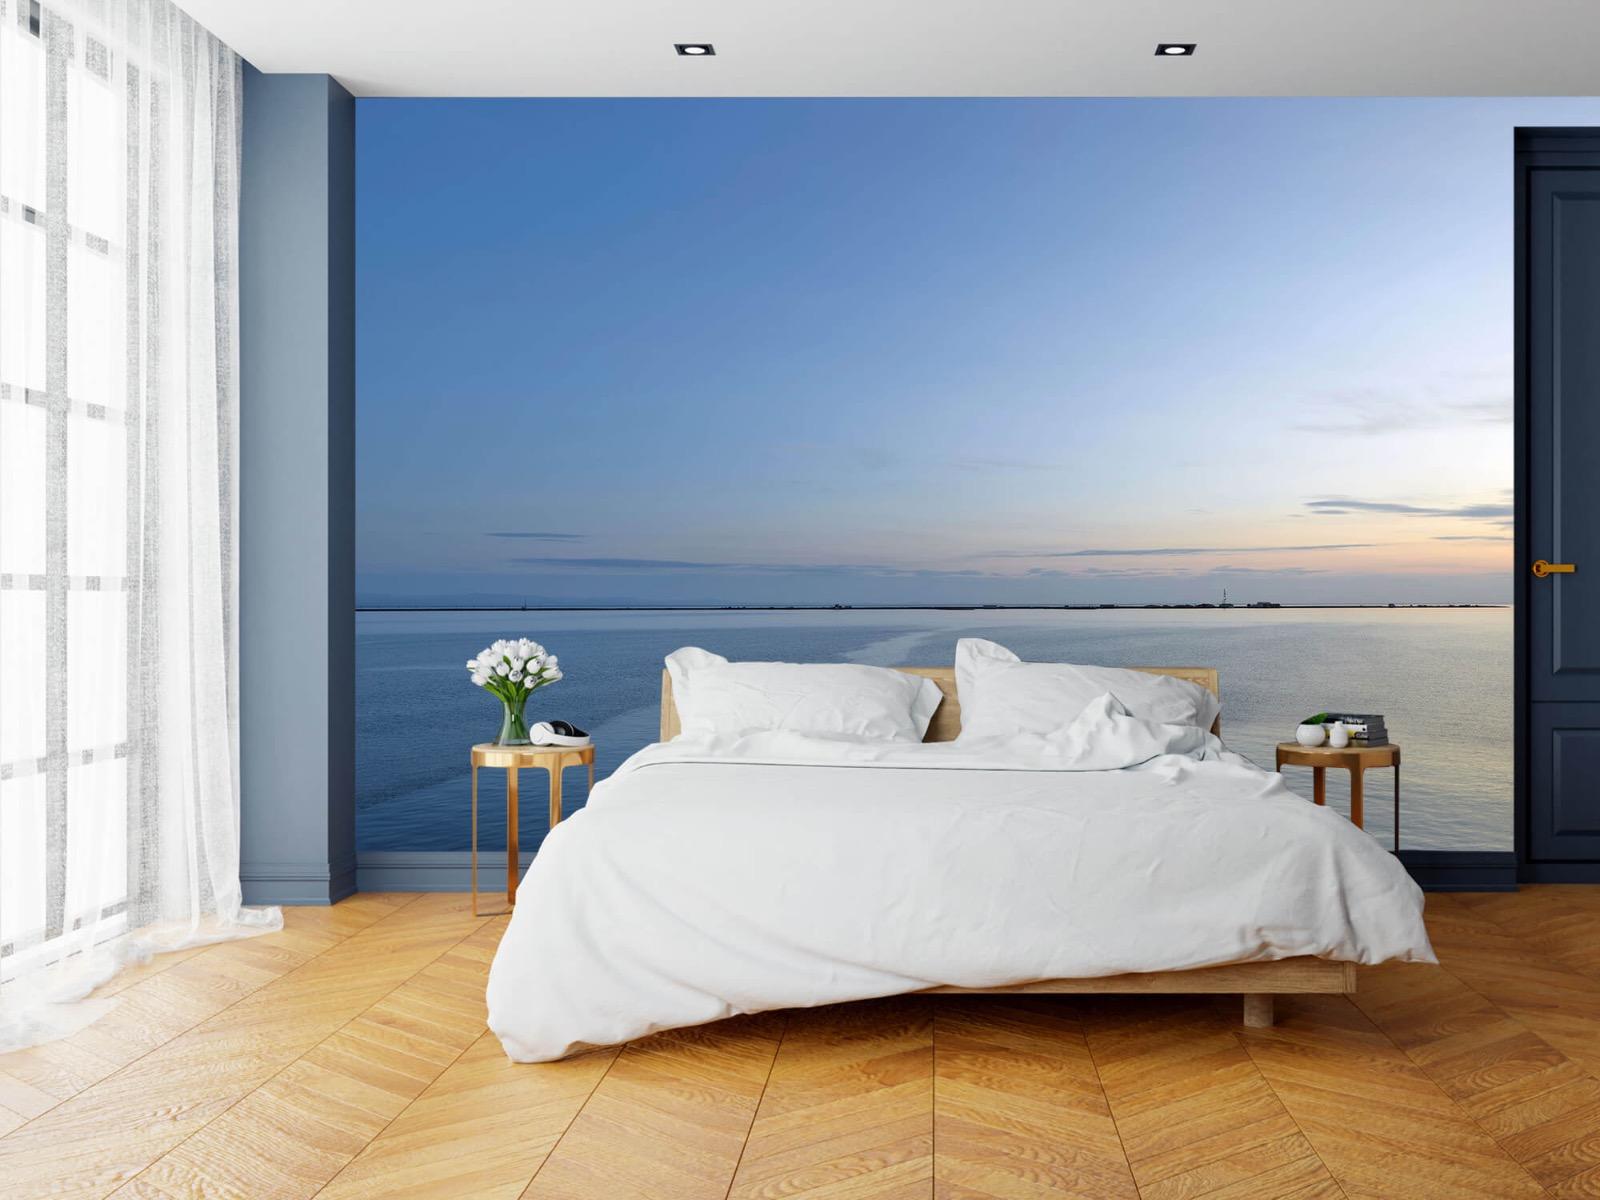 Zeeën en Oceanen - Zee en zonsopkomst - Wallexclusive - Woonkamer 15